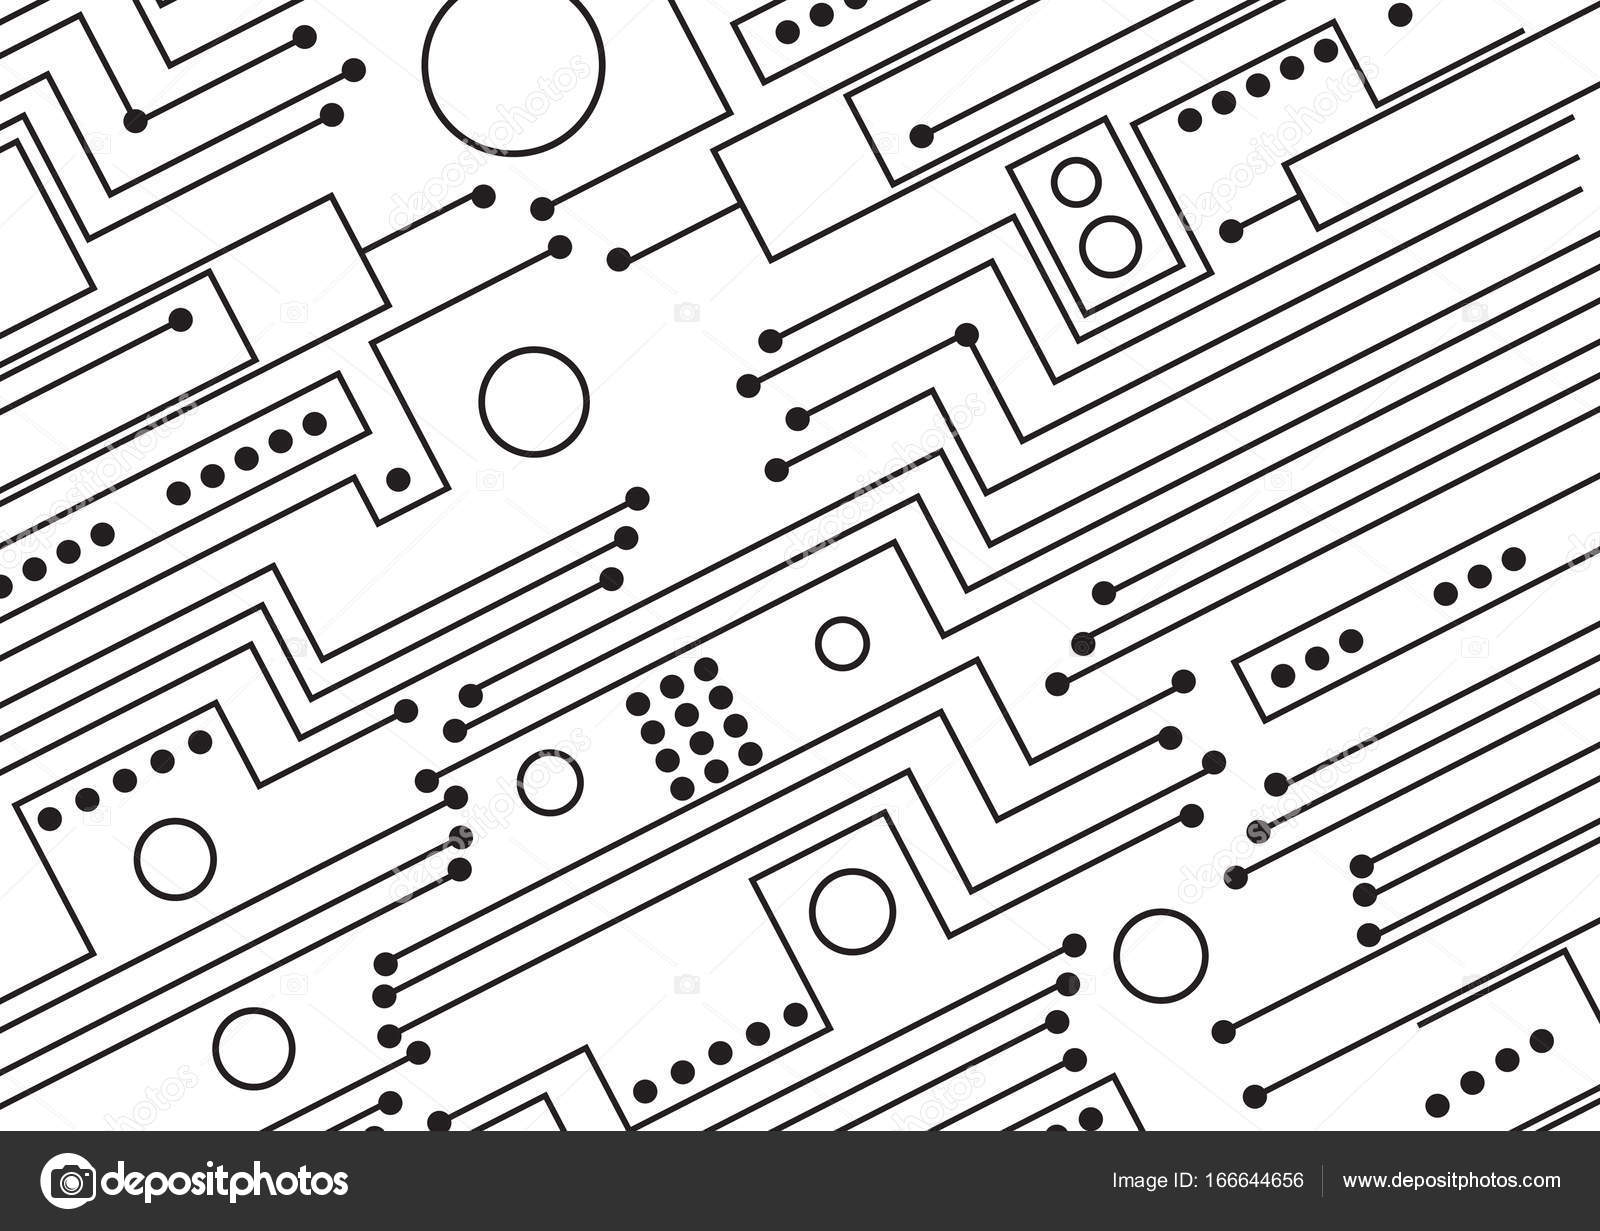 Computer Circuit Board Illustration